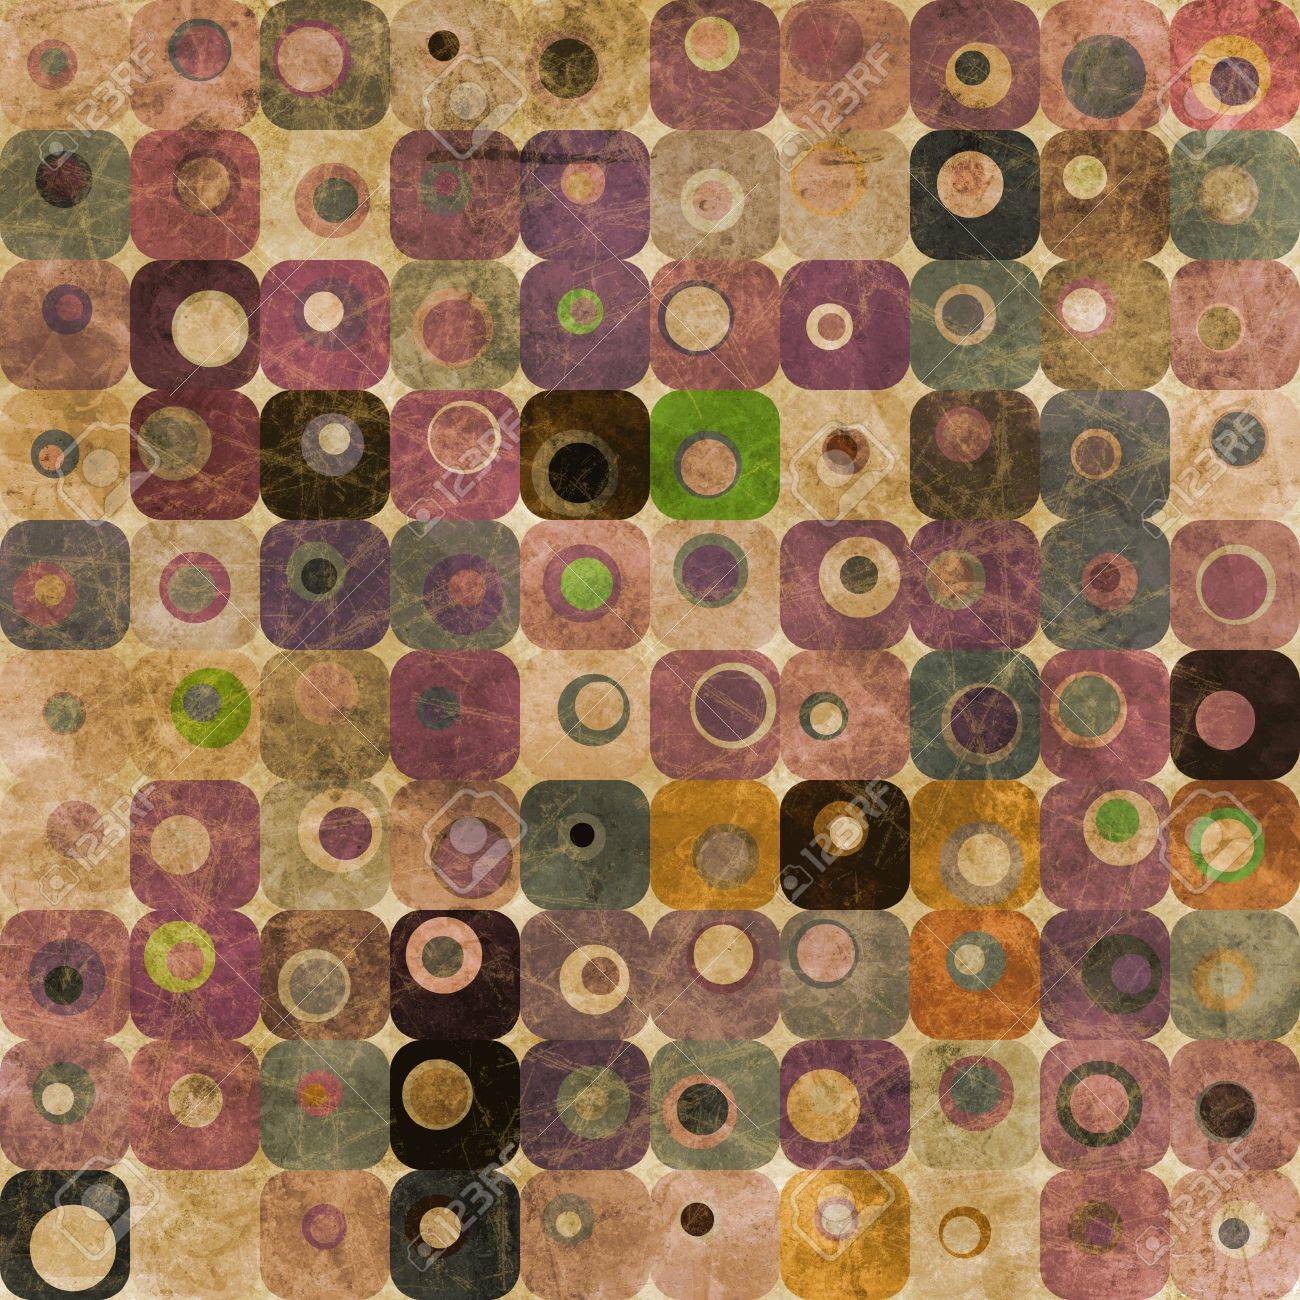 Abstract squares and circles Stock Photo - 9365532